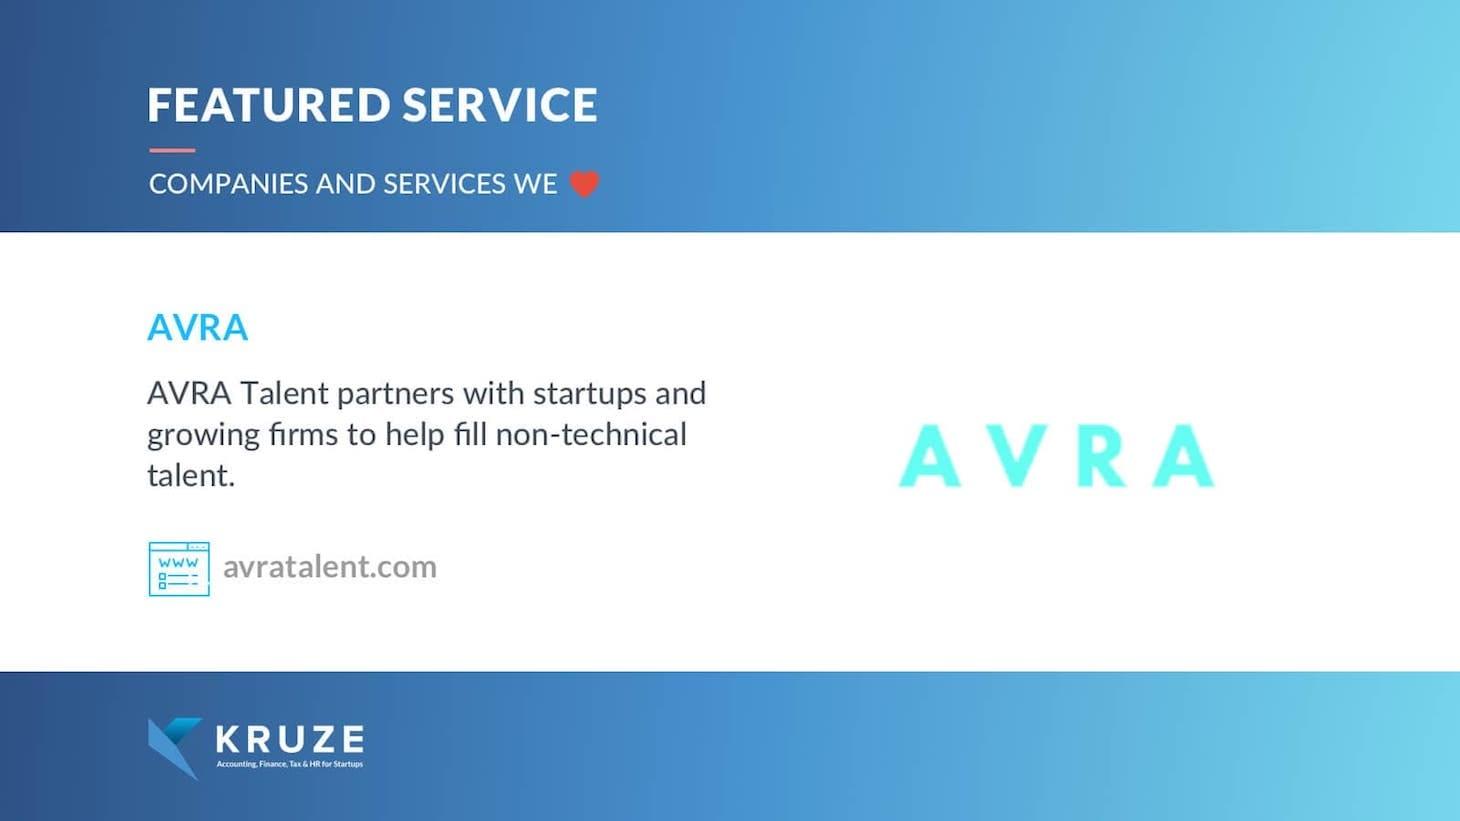 Featured Service - AVRA Talent